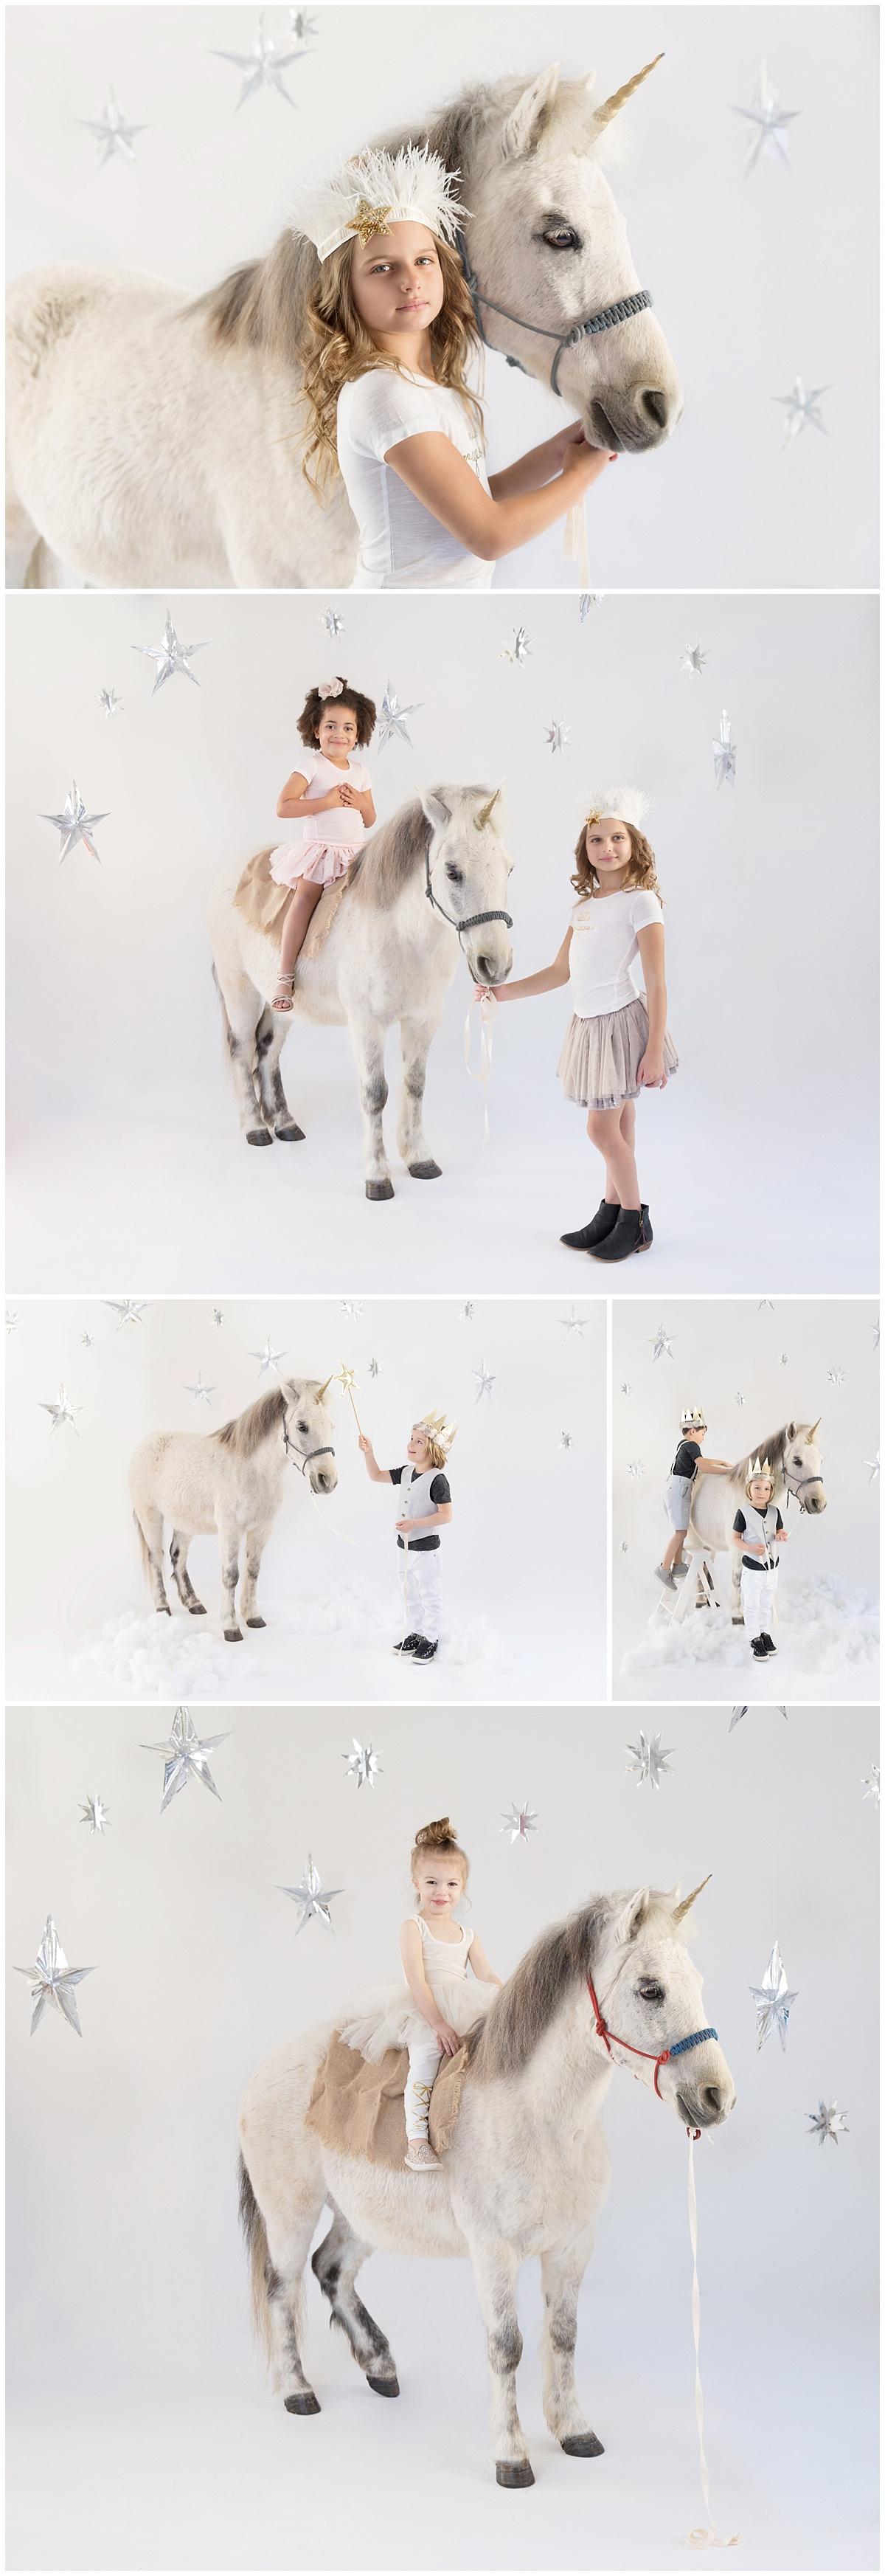 Magical_Unicorn_Photo_Shoot